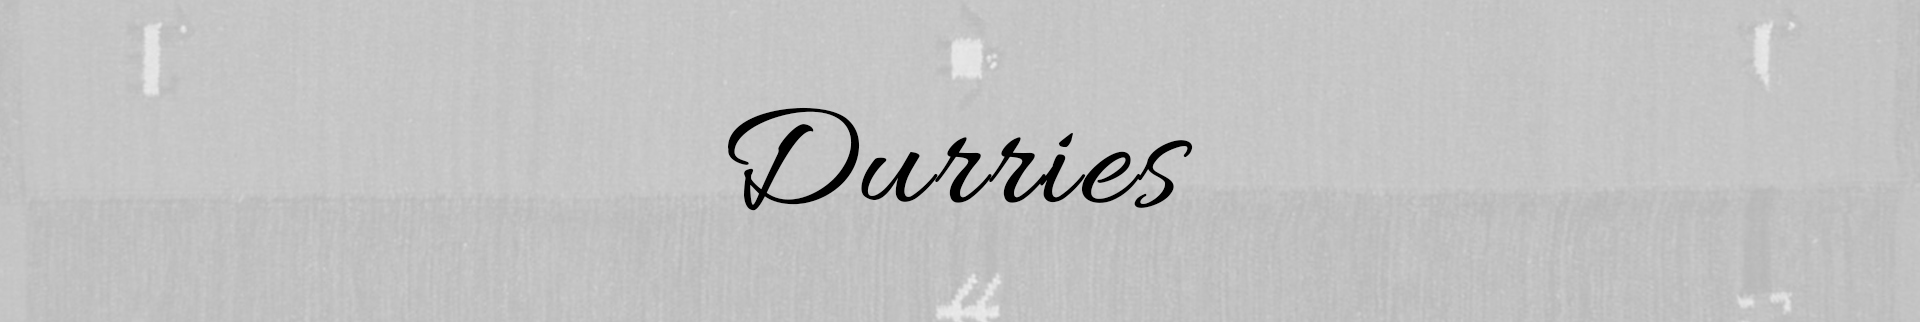 Durries